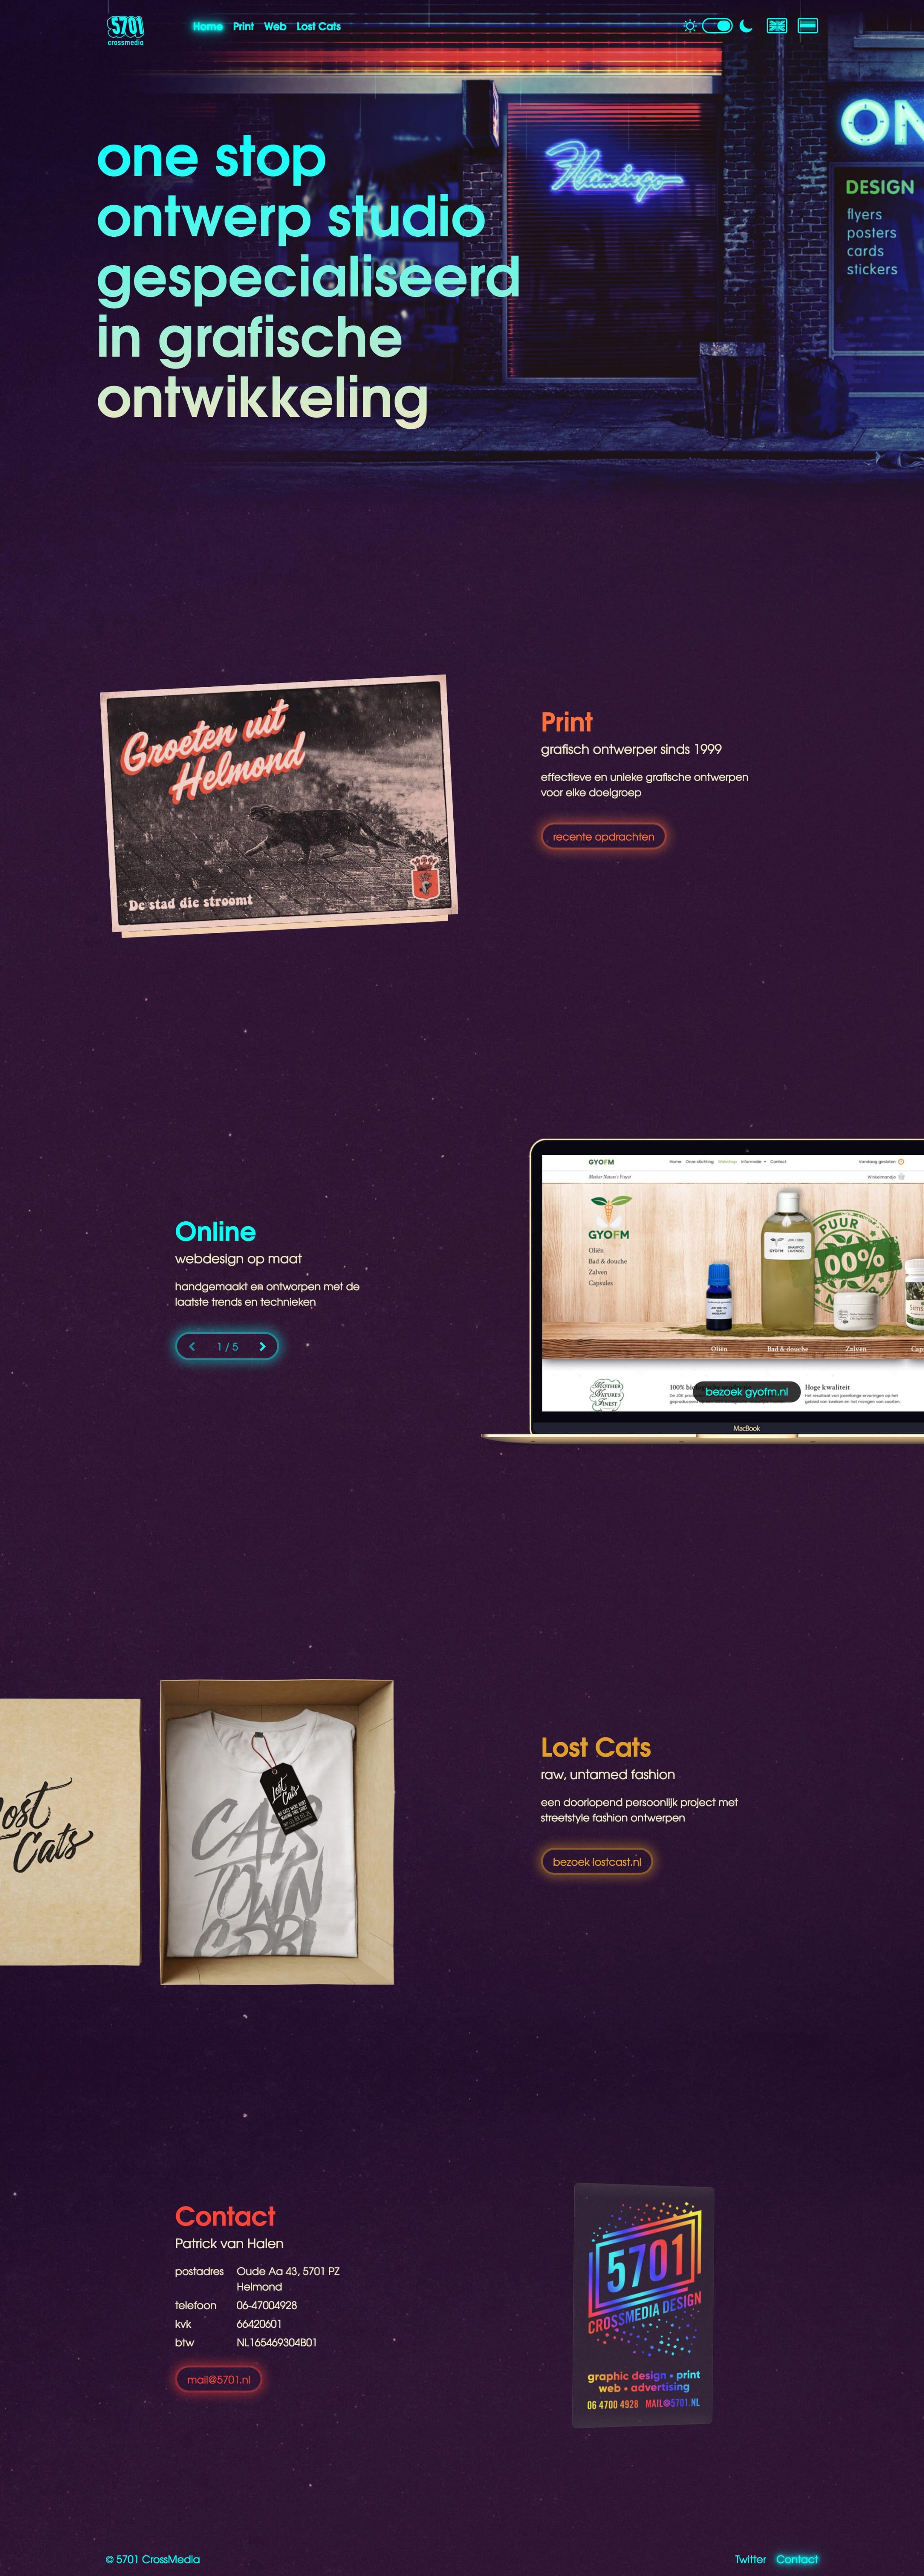 5701 CrossMedia Website Screenshot